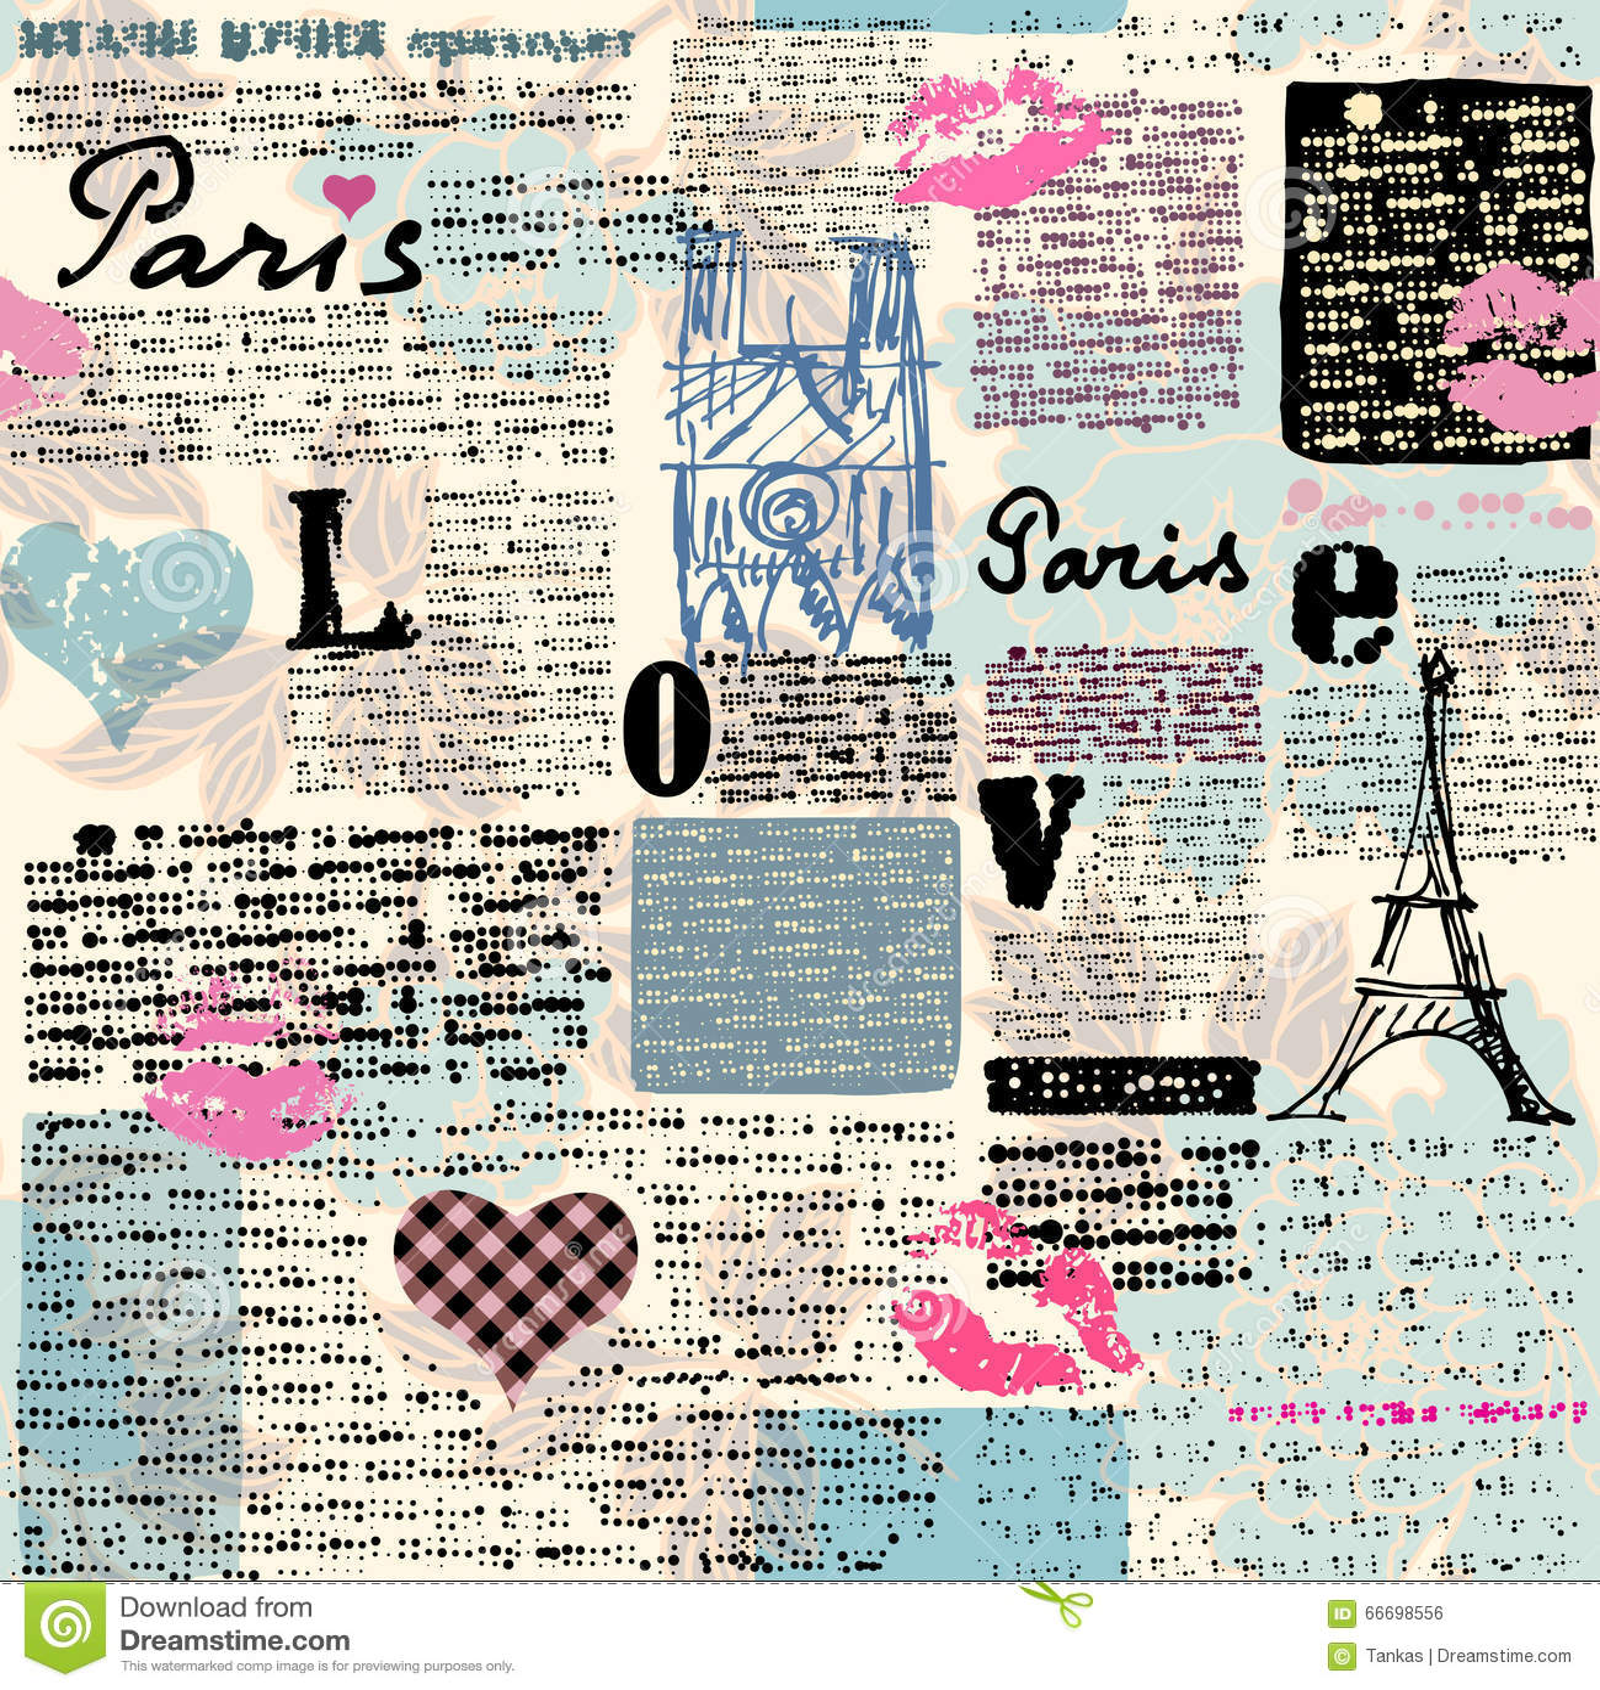 newspaper paris with a kisses stock vector illustration of pattern scrapbook 66698556. Black Bedroom Furniture Sets. Home Design Ideas